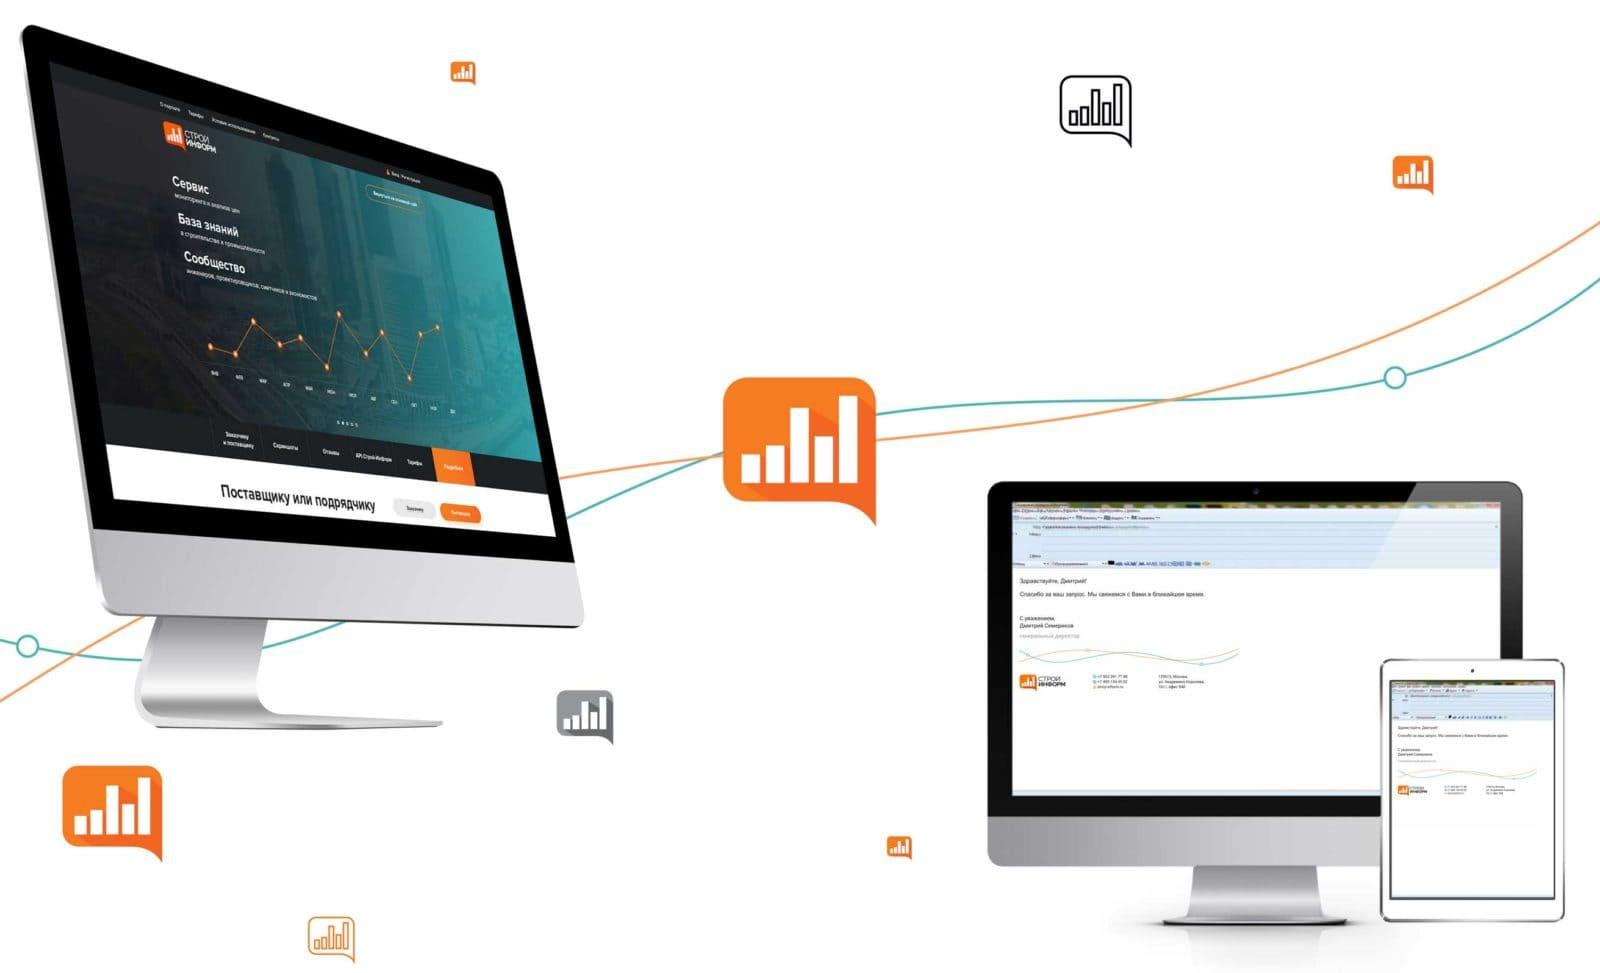 Создание гайдлайна - шаблон электронного письма